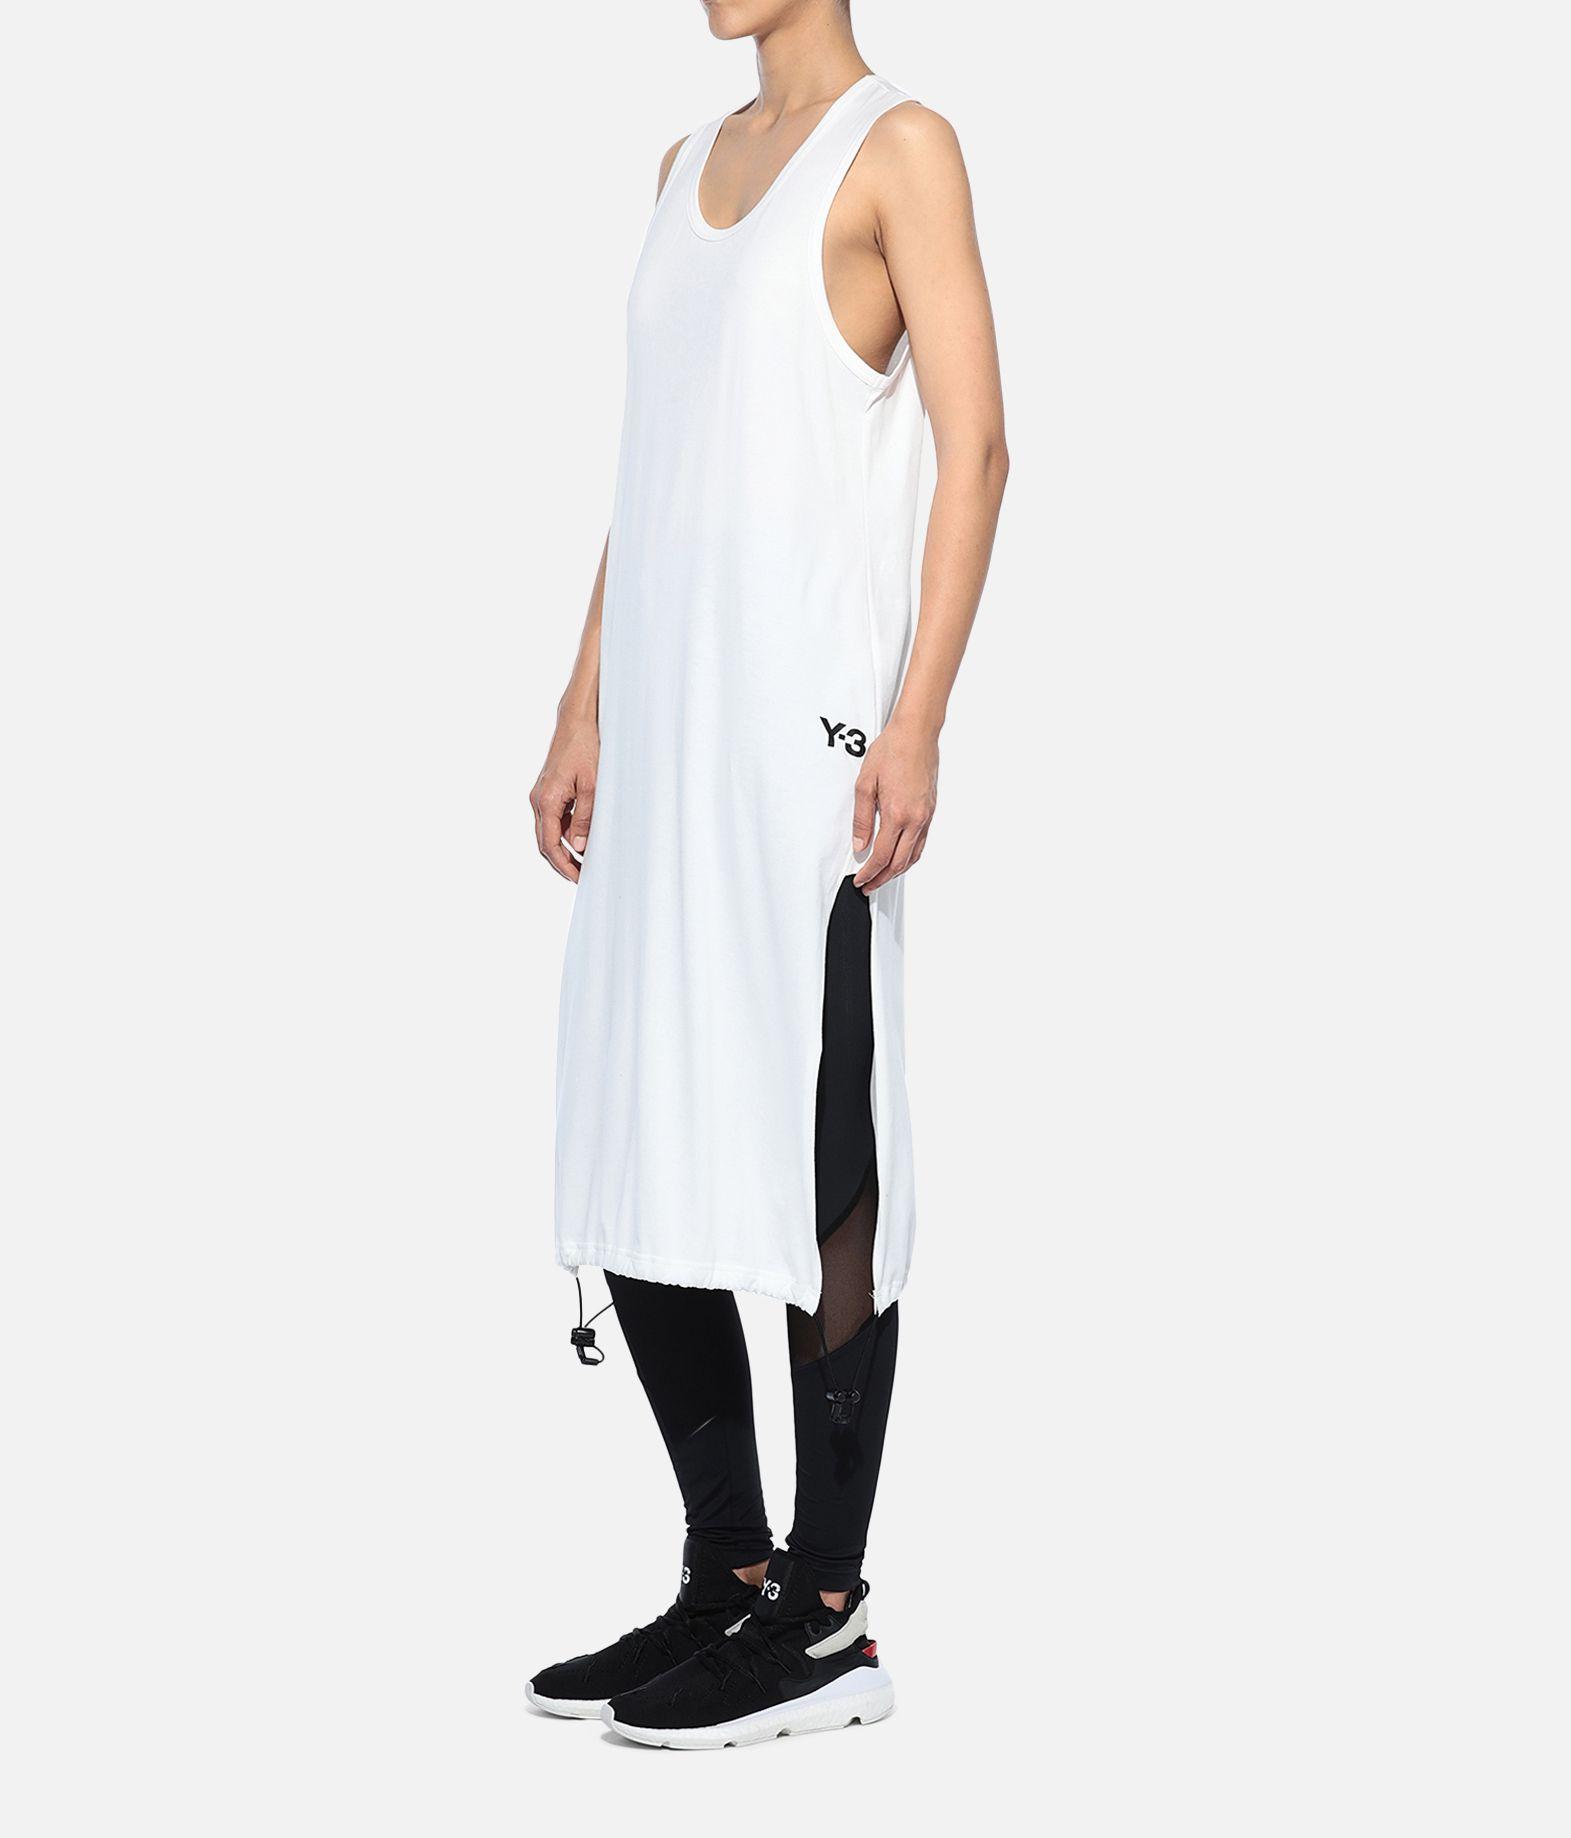 Y-3 Y-3 Drawstring Long Tank Top Sleeveless t-shirt Woman e